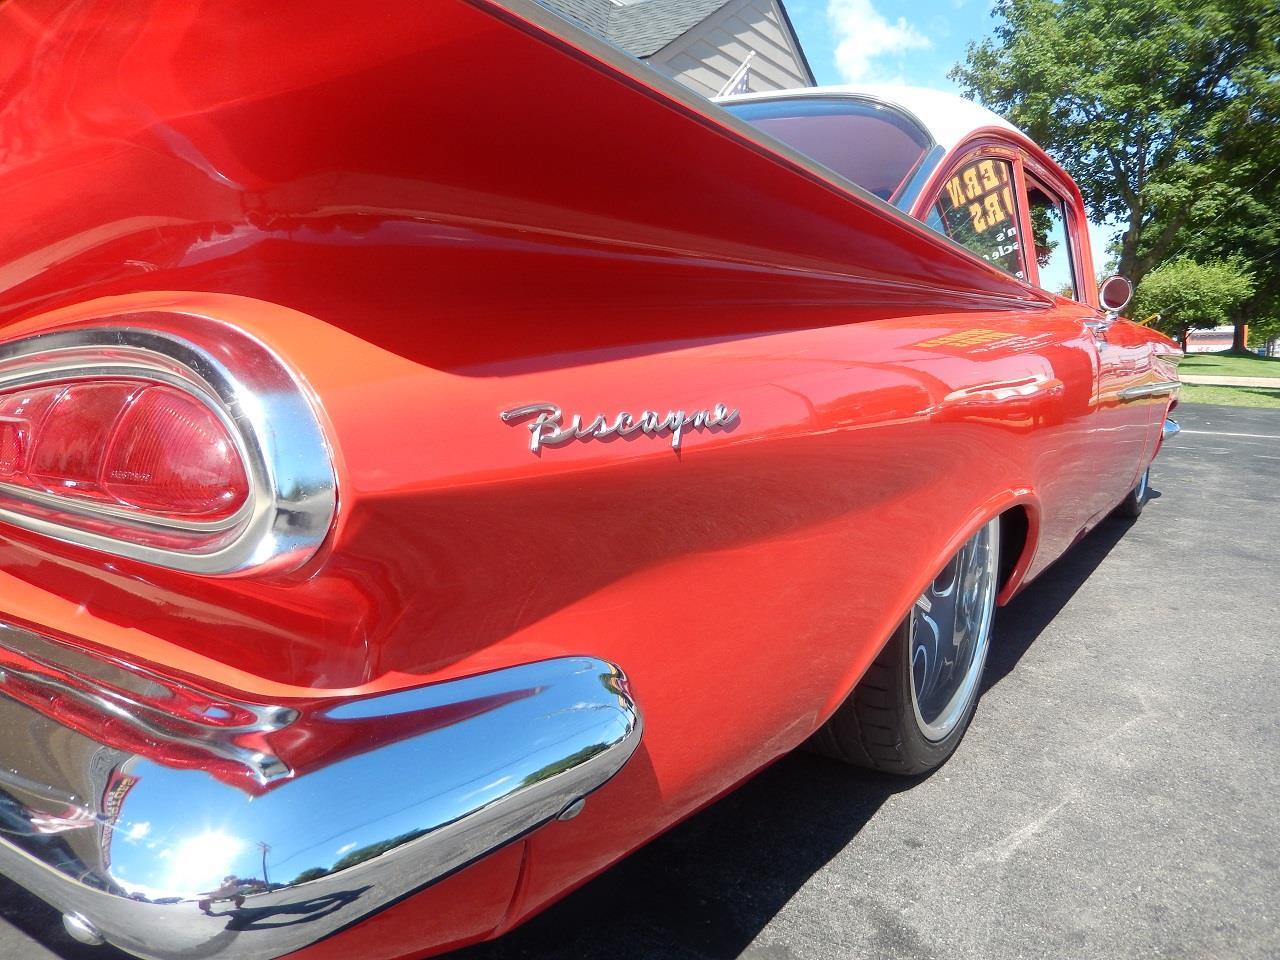 1959 Chevrolet Biscayne (CC-1367527) for sale in Clarkston, Michigan